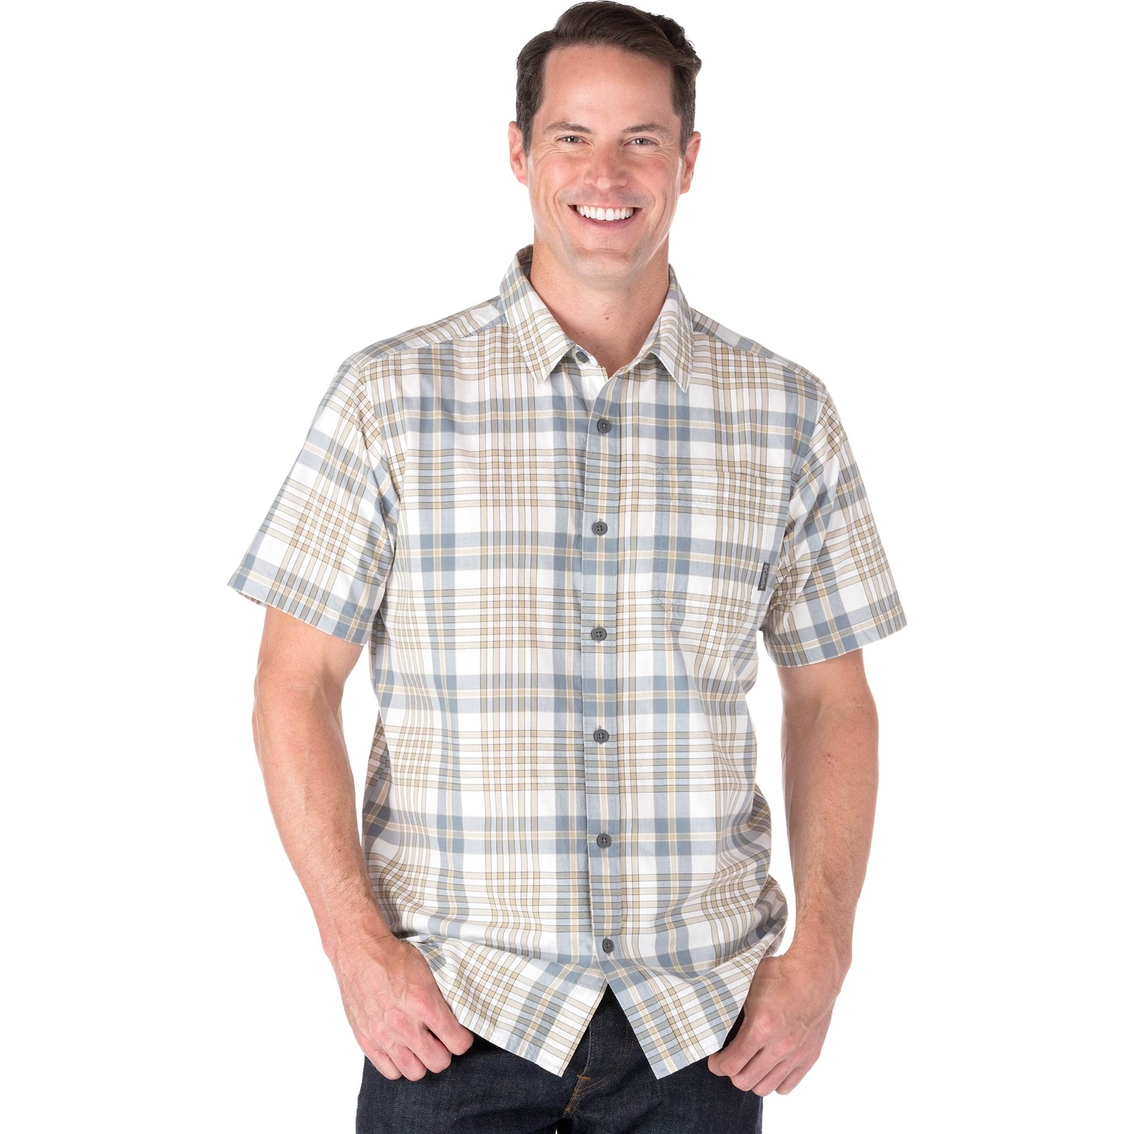 e39a750d430 Columbia Sportswear Thompson Hill Ii Yarn Dye Shirt | Casual ...